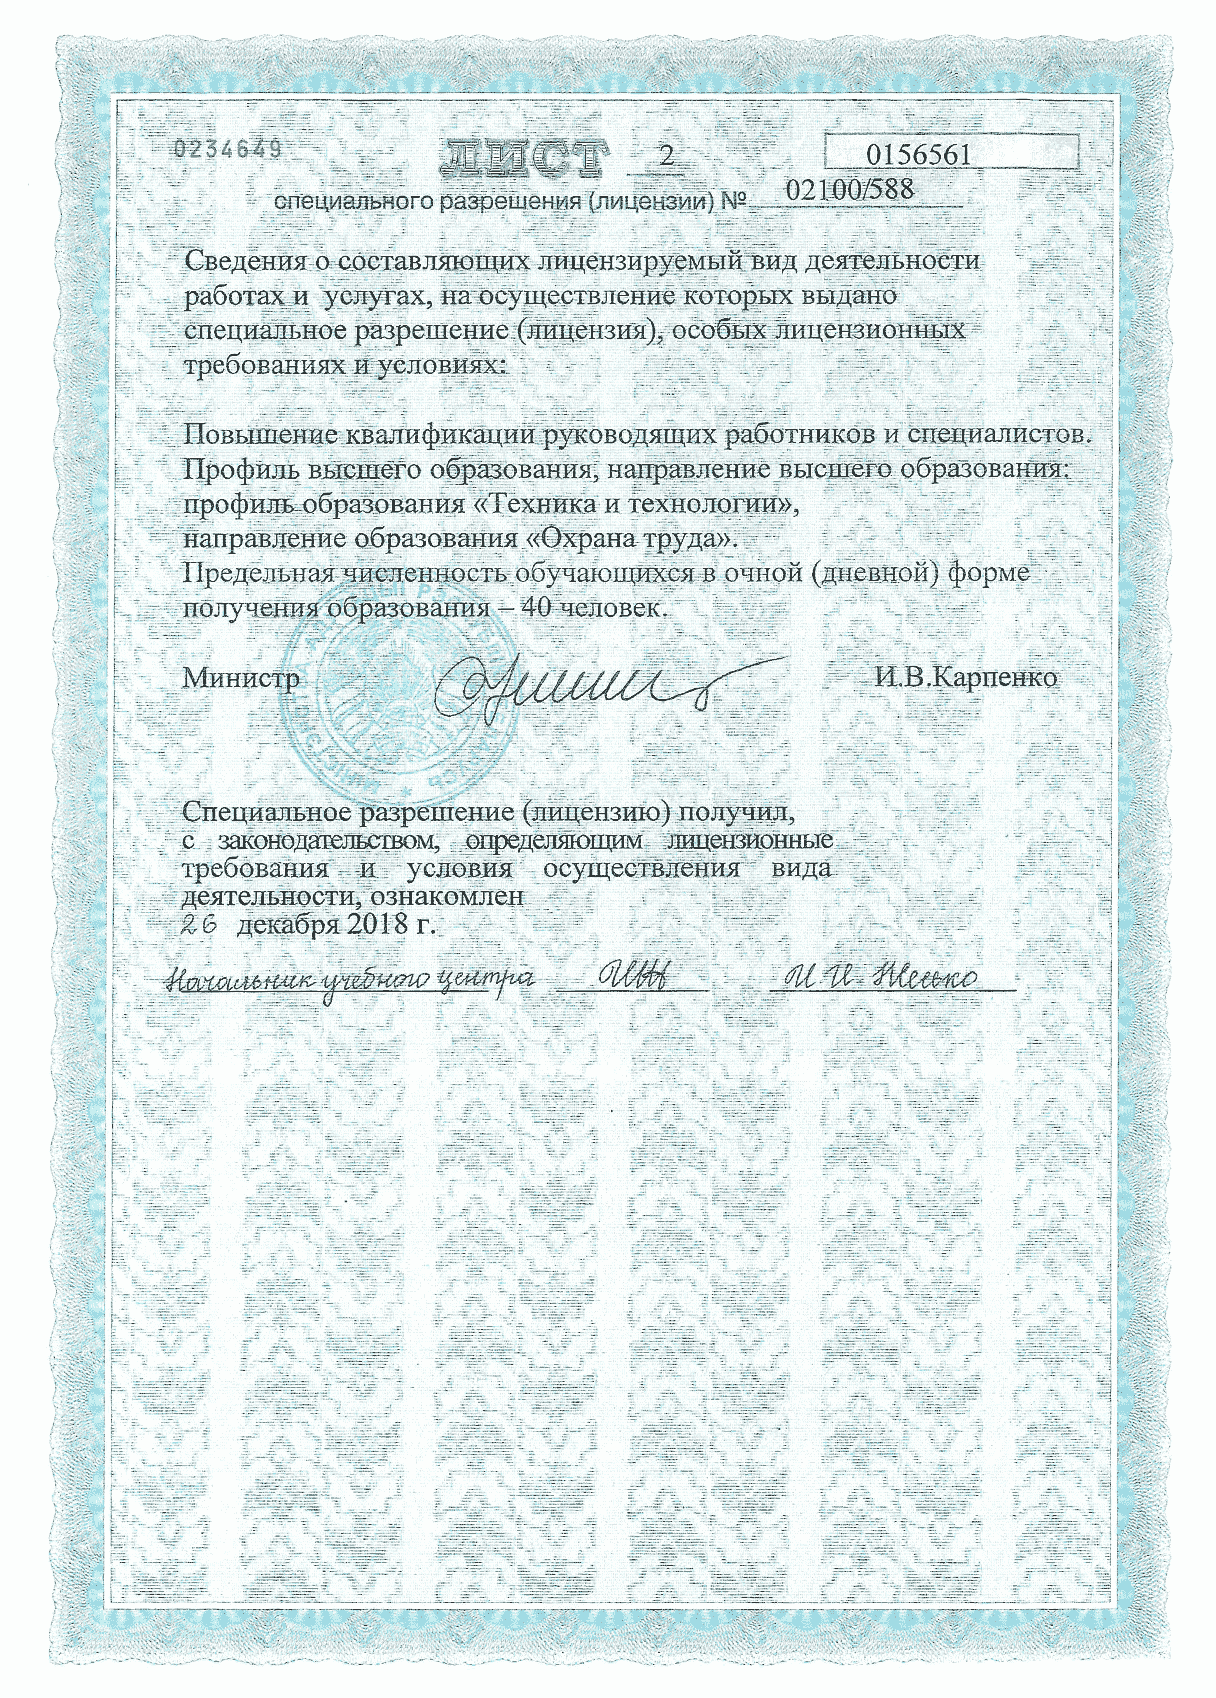 Аккредитация учебного отдела